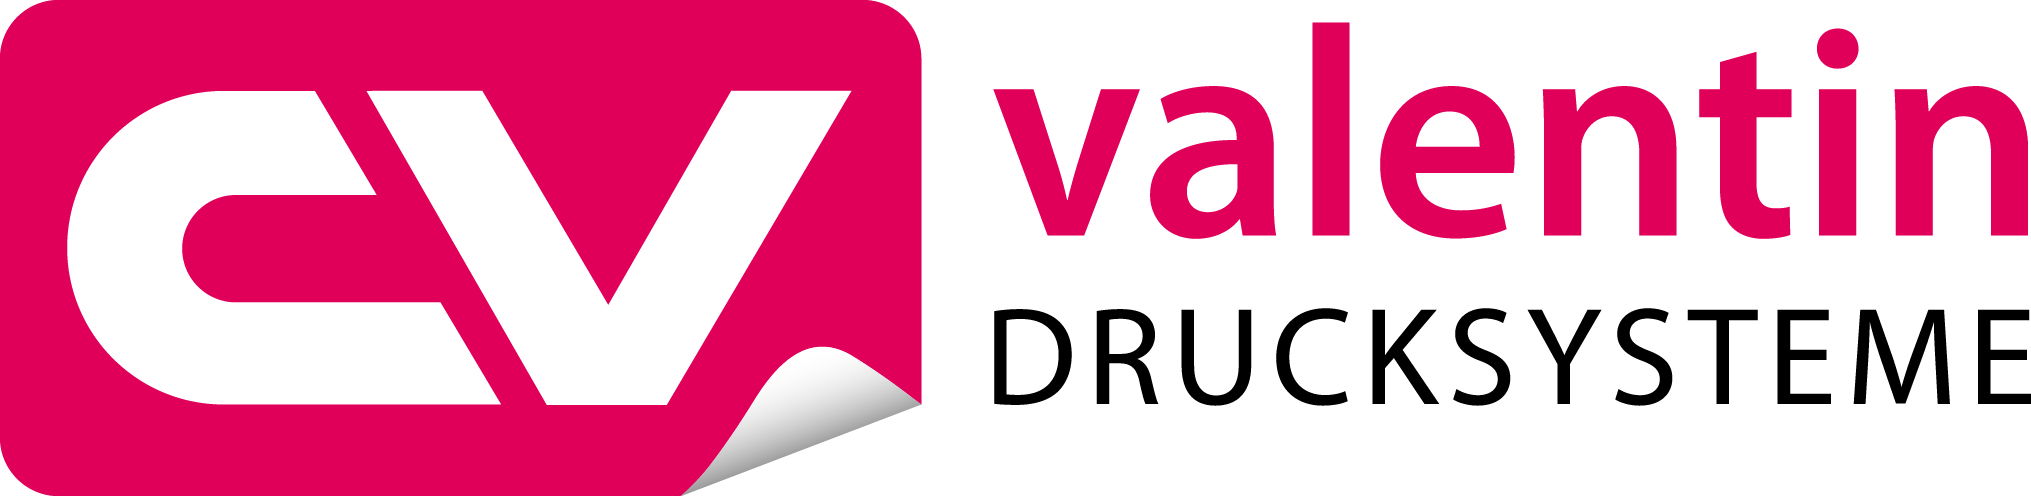 Logotipo de Carl Valentin Drucksysteme